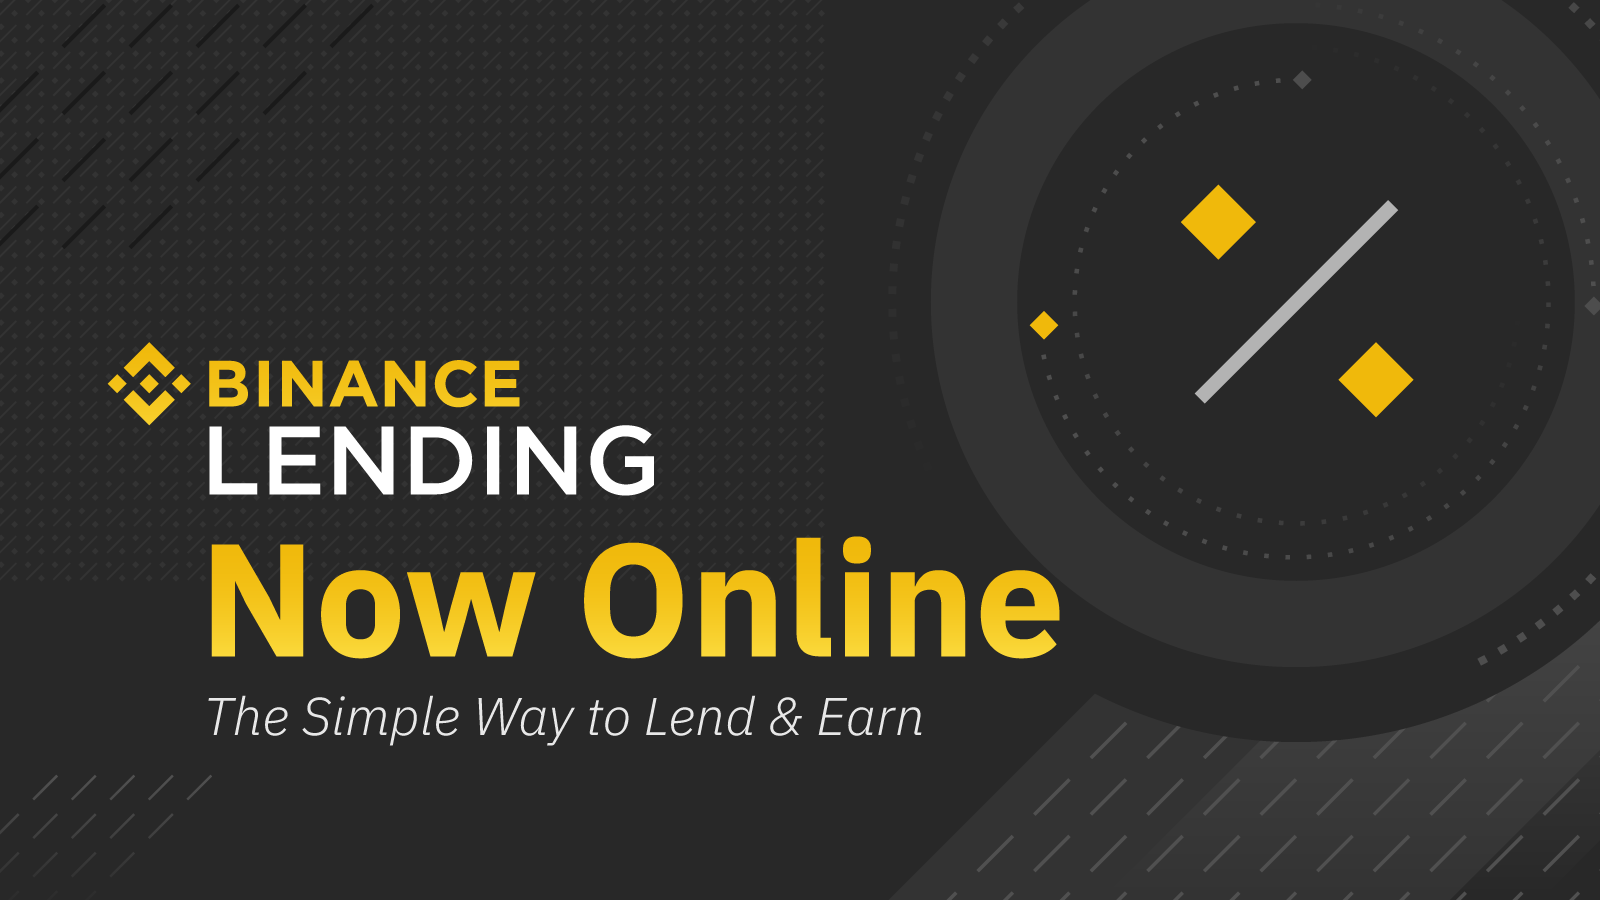 Binance Lending - lokaty w kryptowalutach do 15%